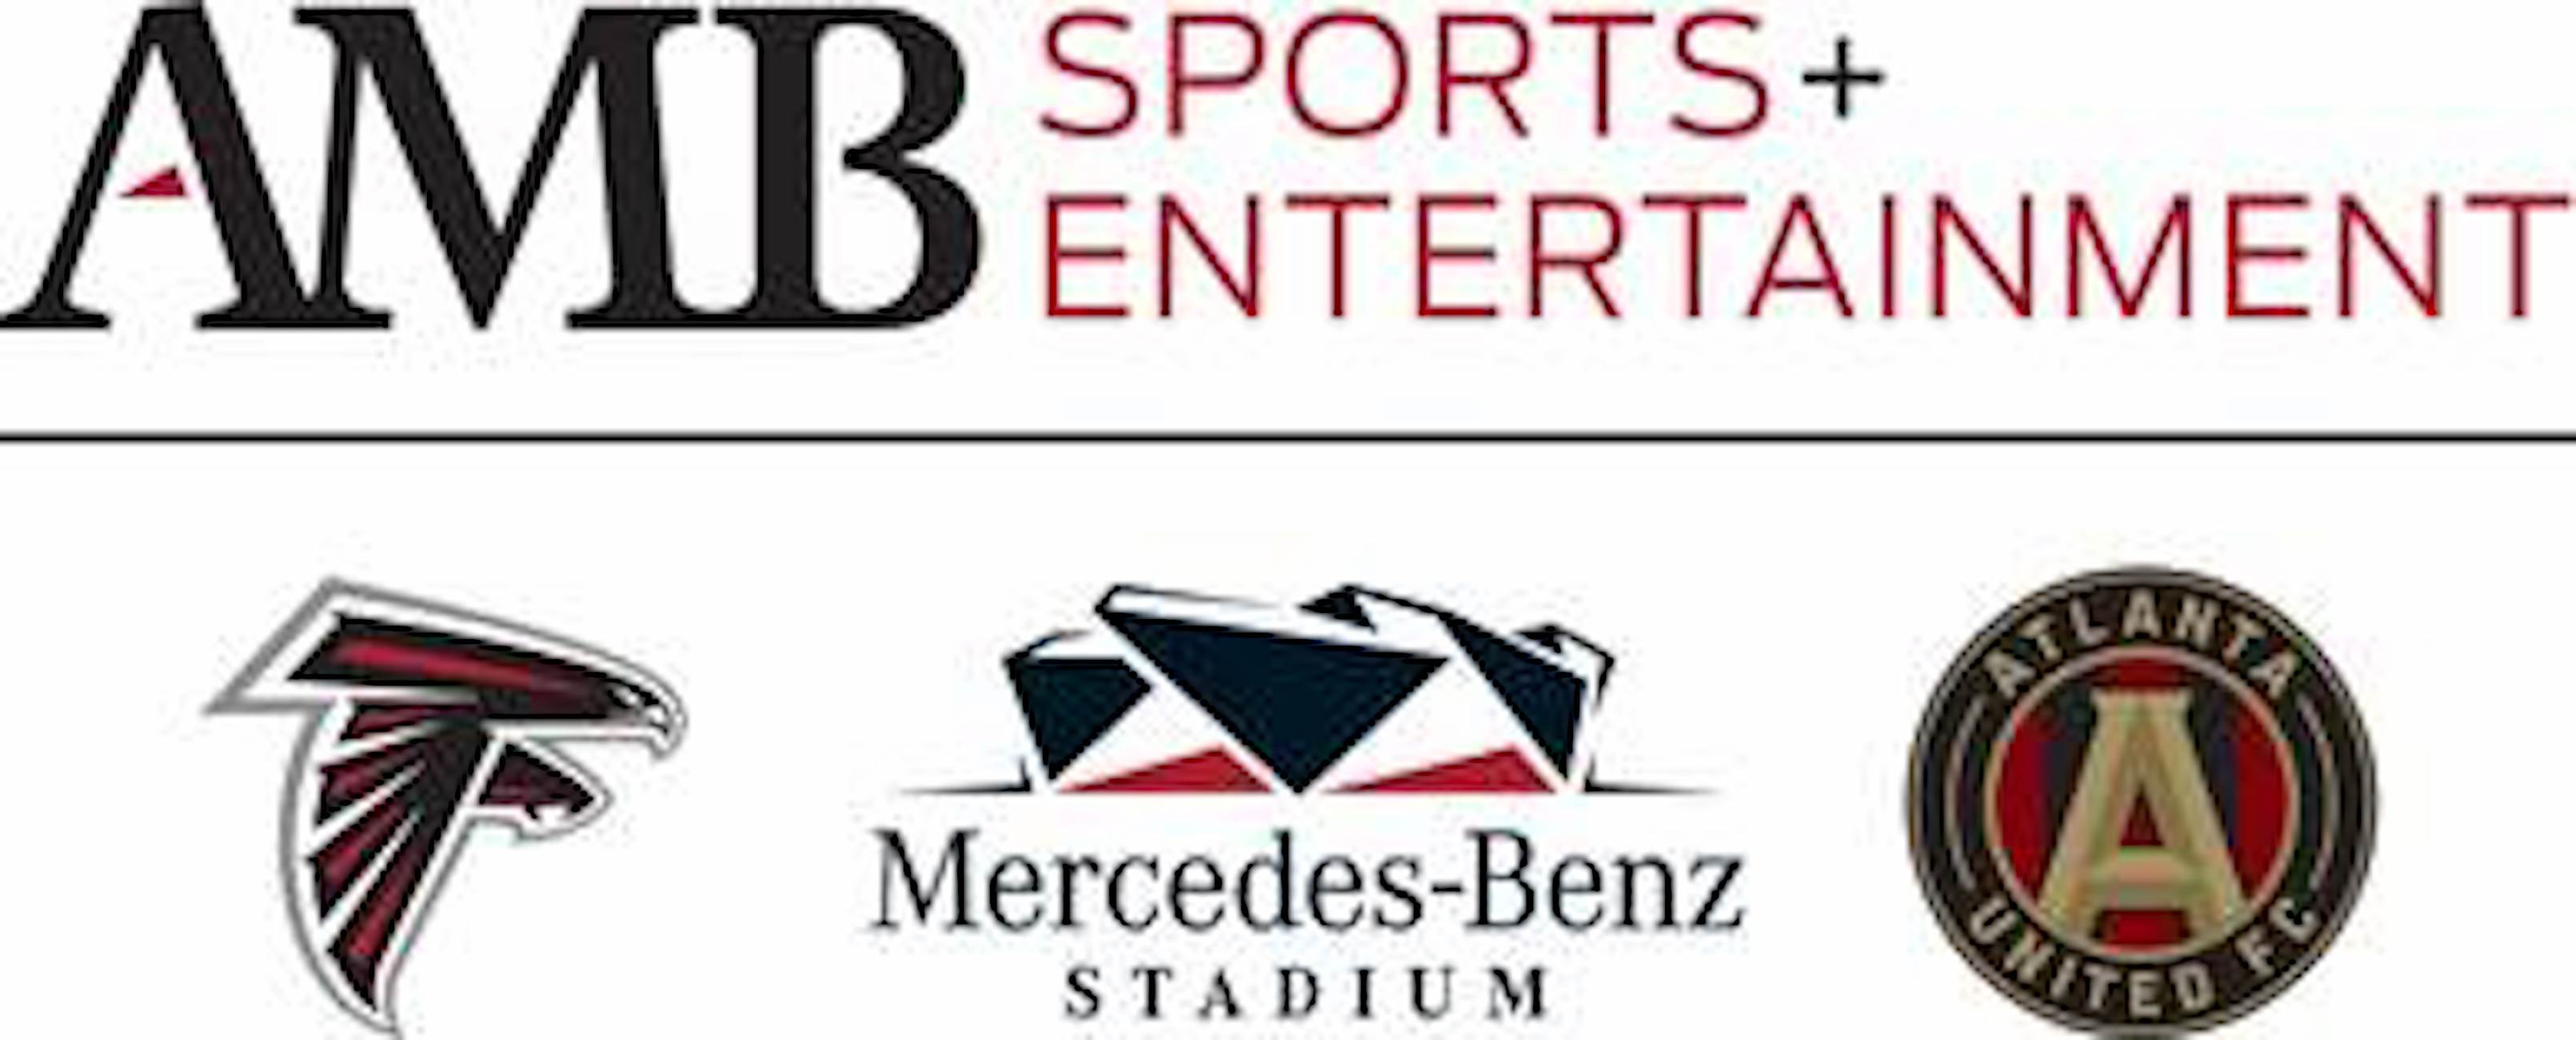 AMB Sports + Entertainment